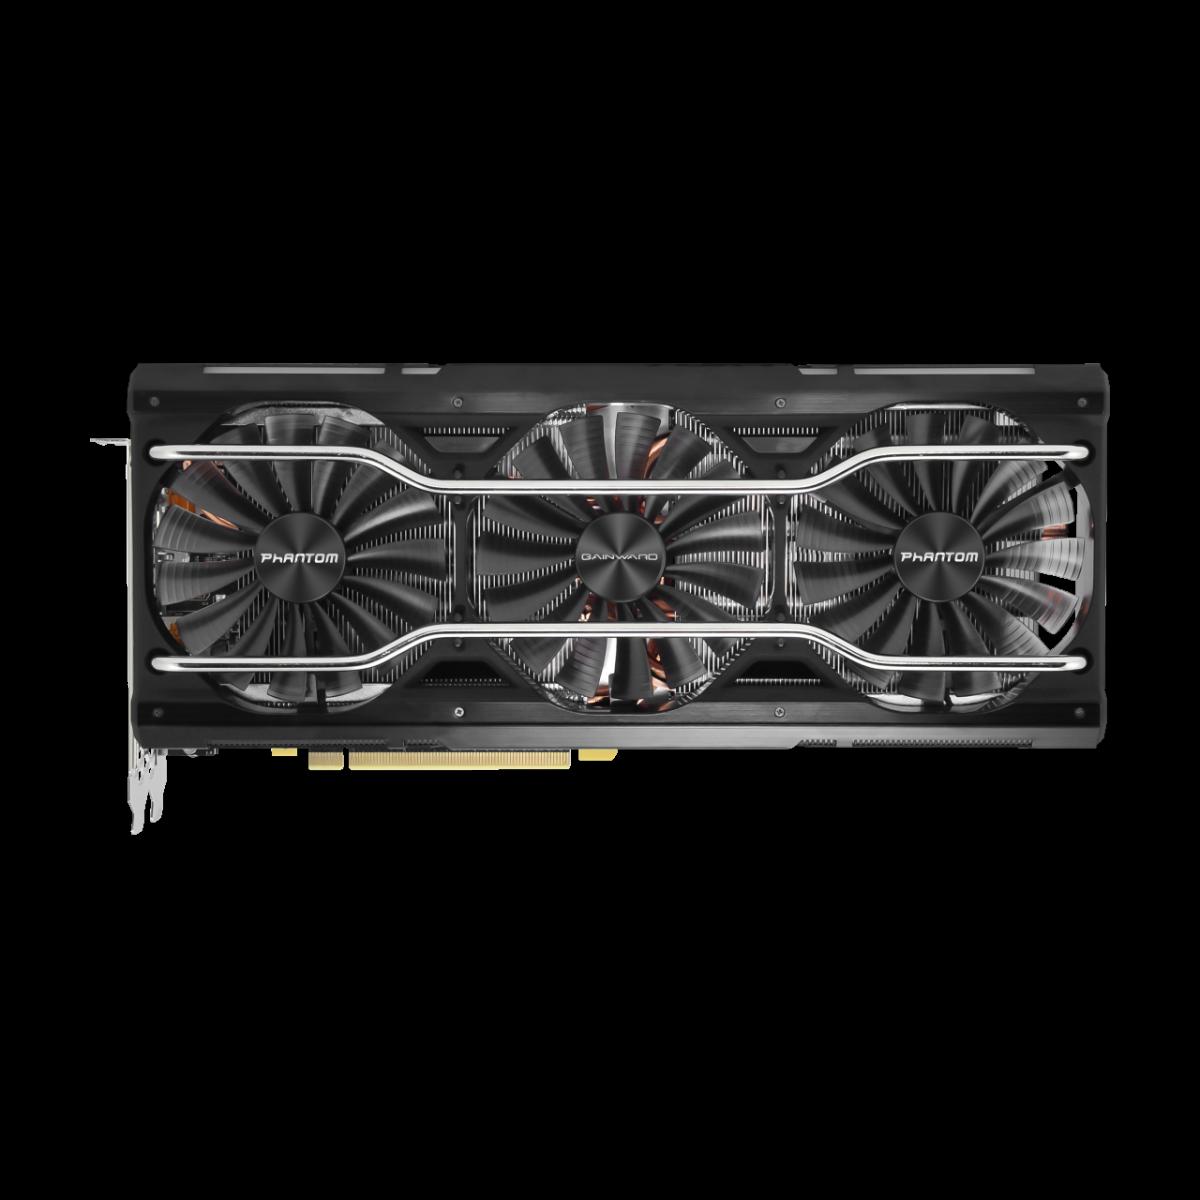 Placa de Vídeo Gainward GeForce RTX 2070 Super Phantom, 8GB GDDR6, 256Bit